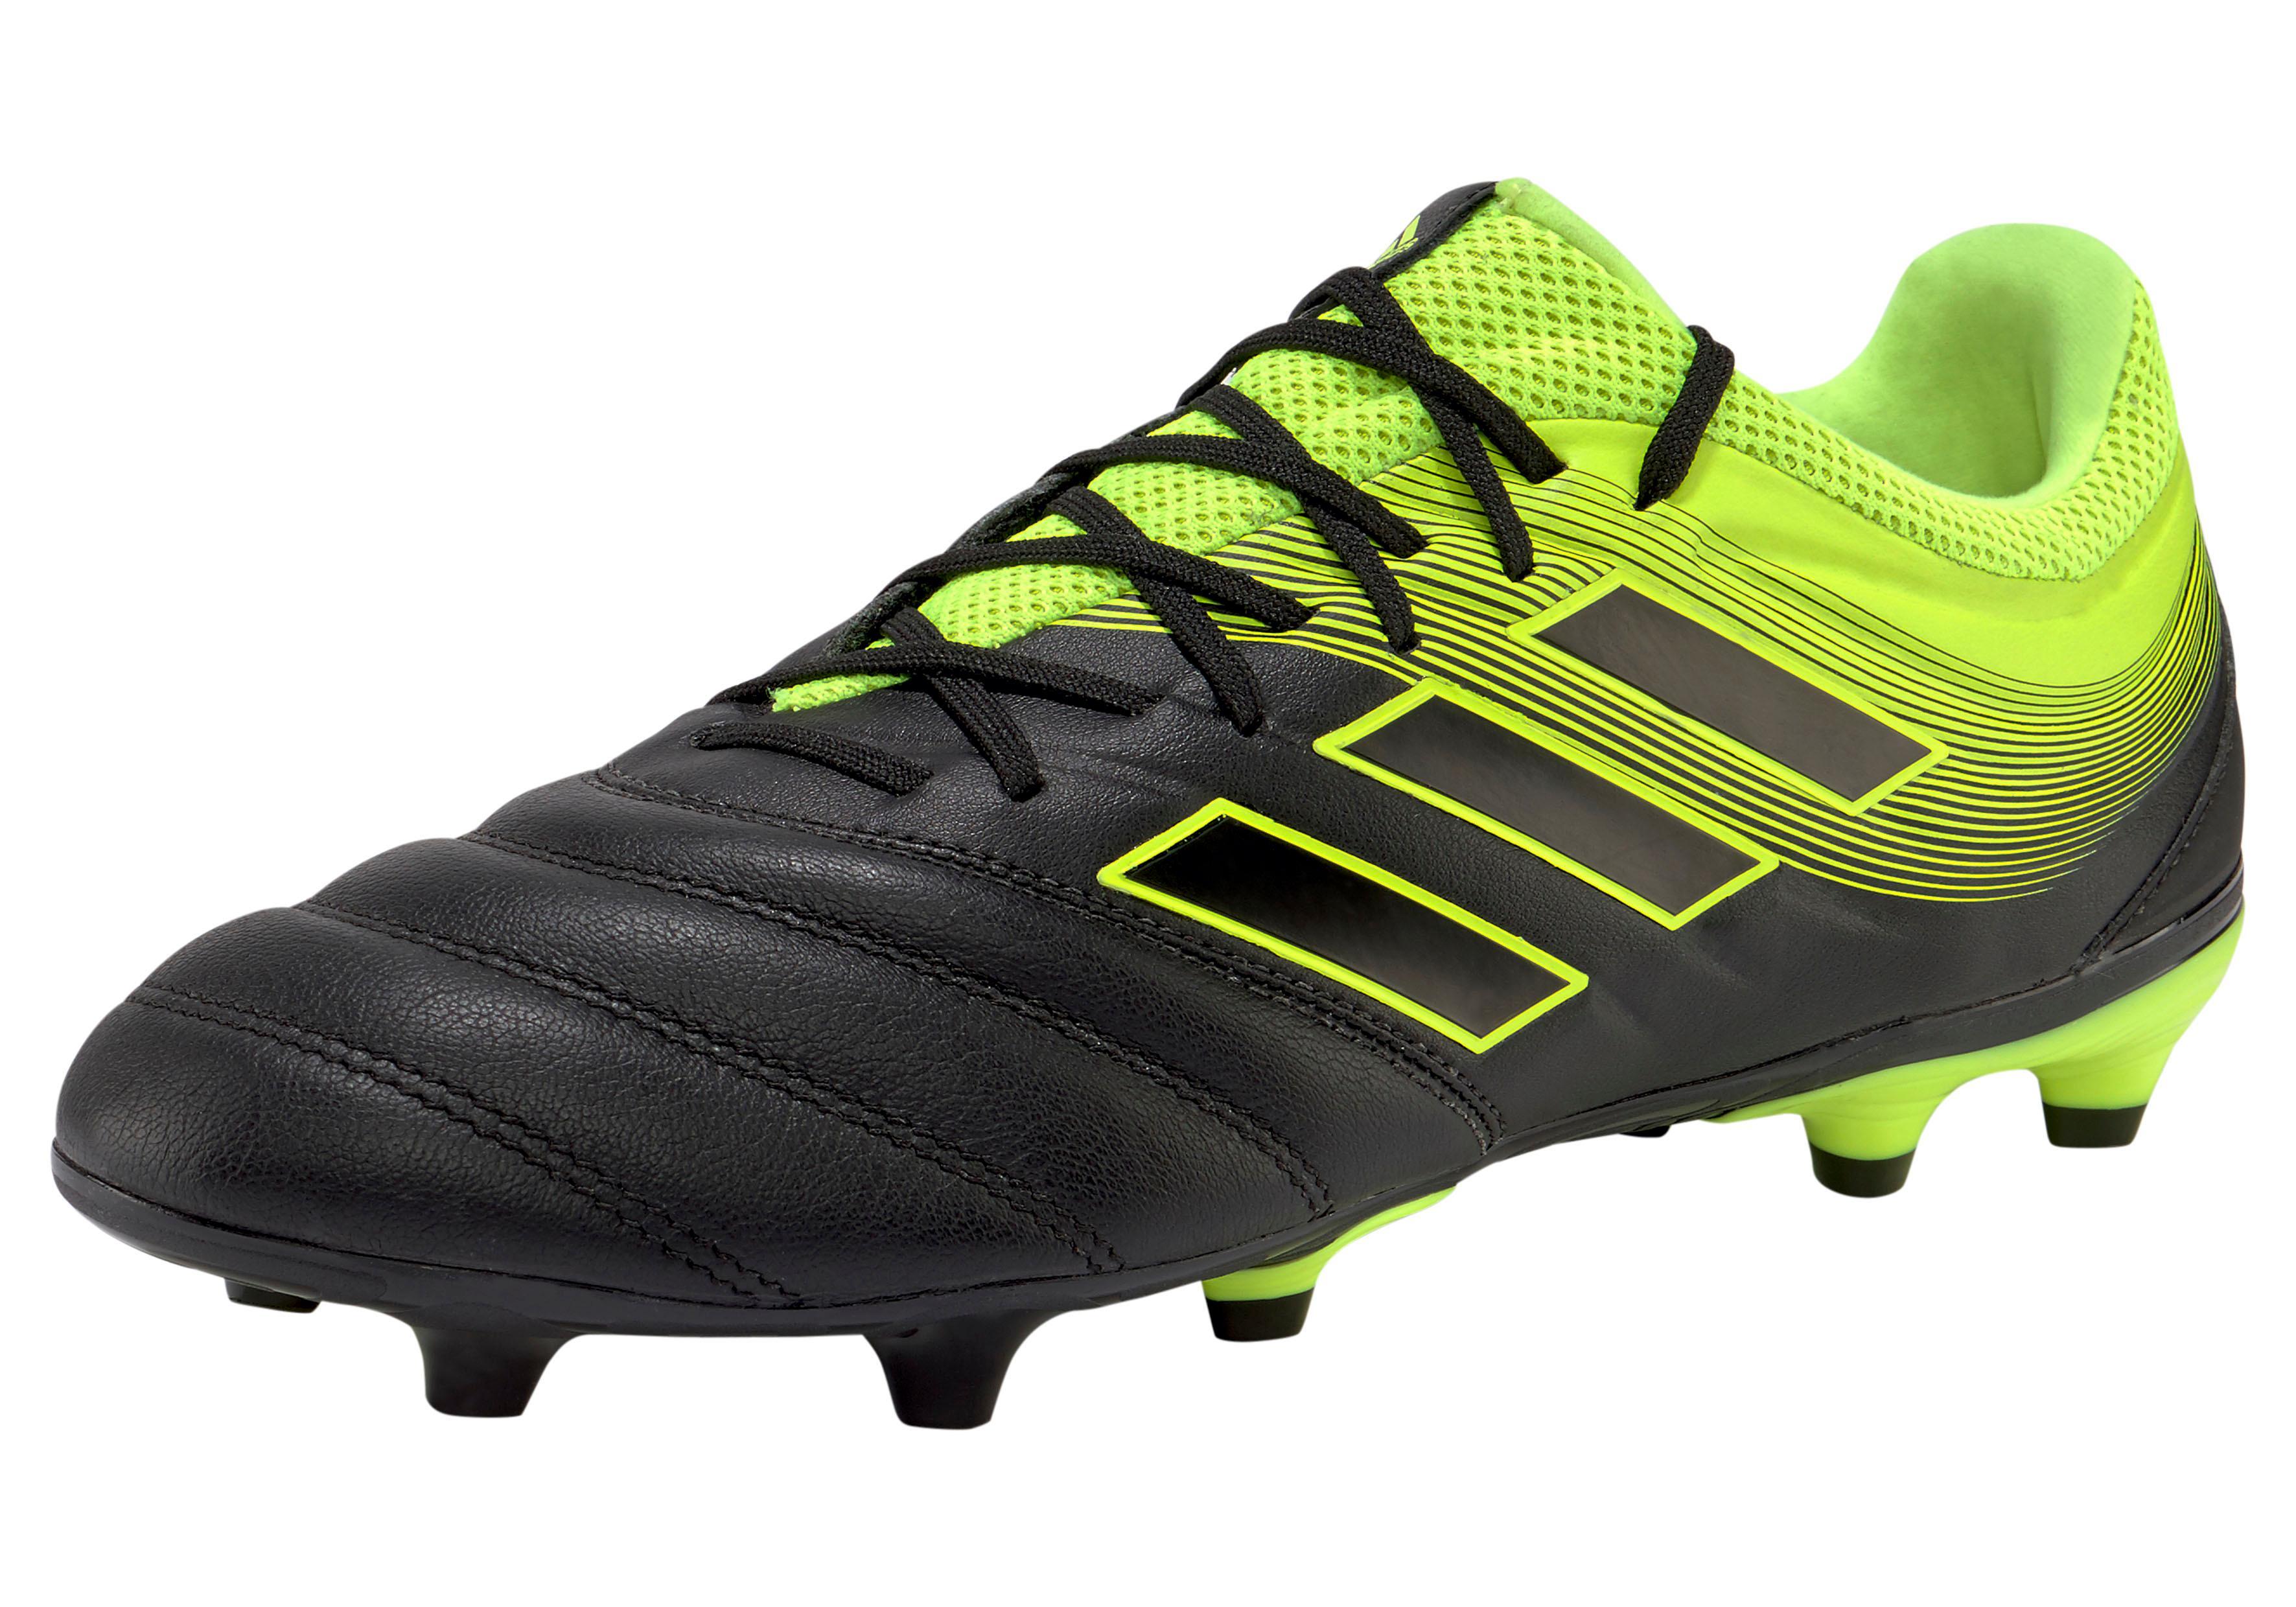 adidas Performance Fußballschuh Copa 193 FG | Schuhe > Sportschuhe > Fußballschuhe | Adidas Performance